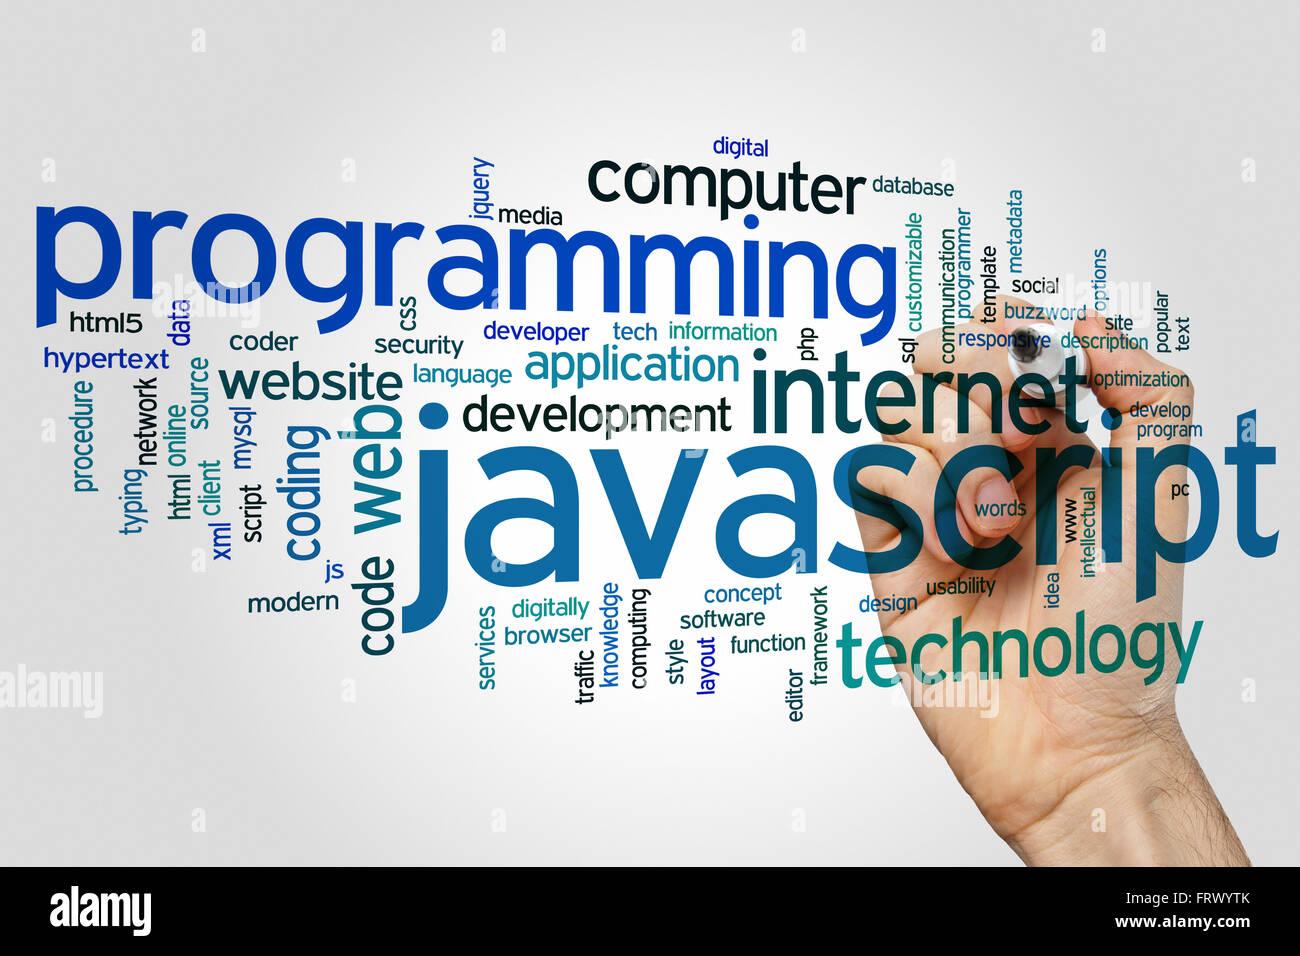 Background image javascript - Javascript Concept Word Cloud Background